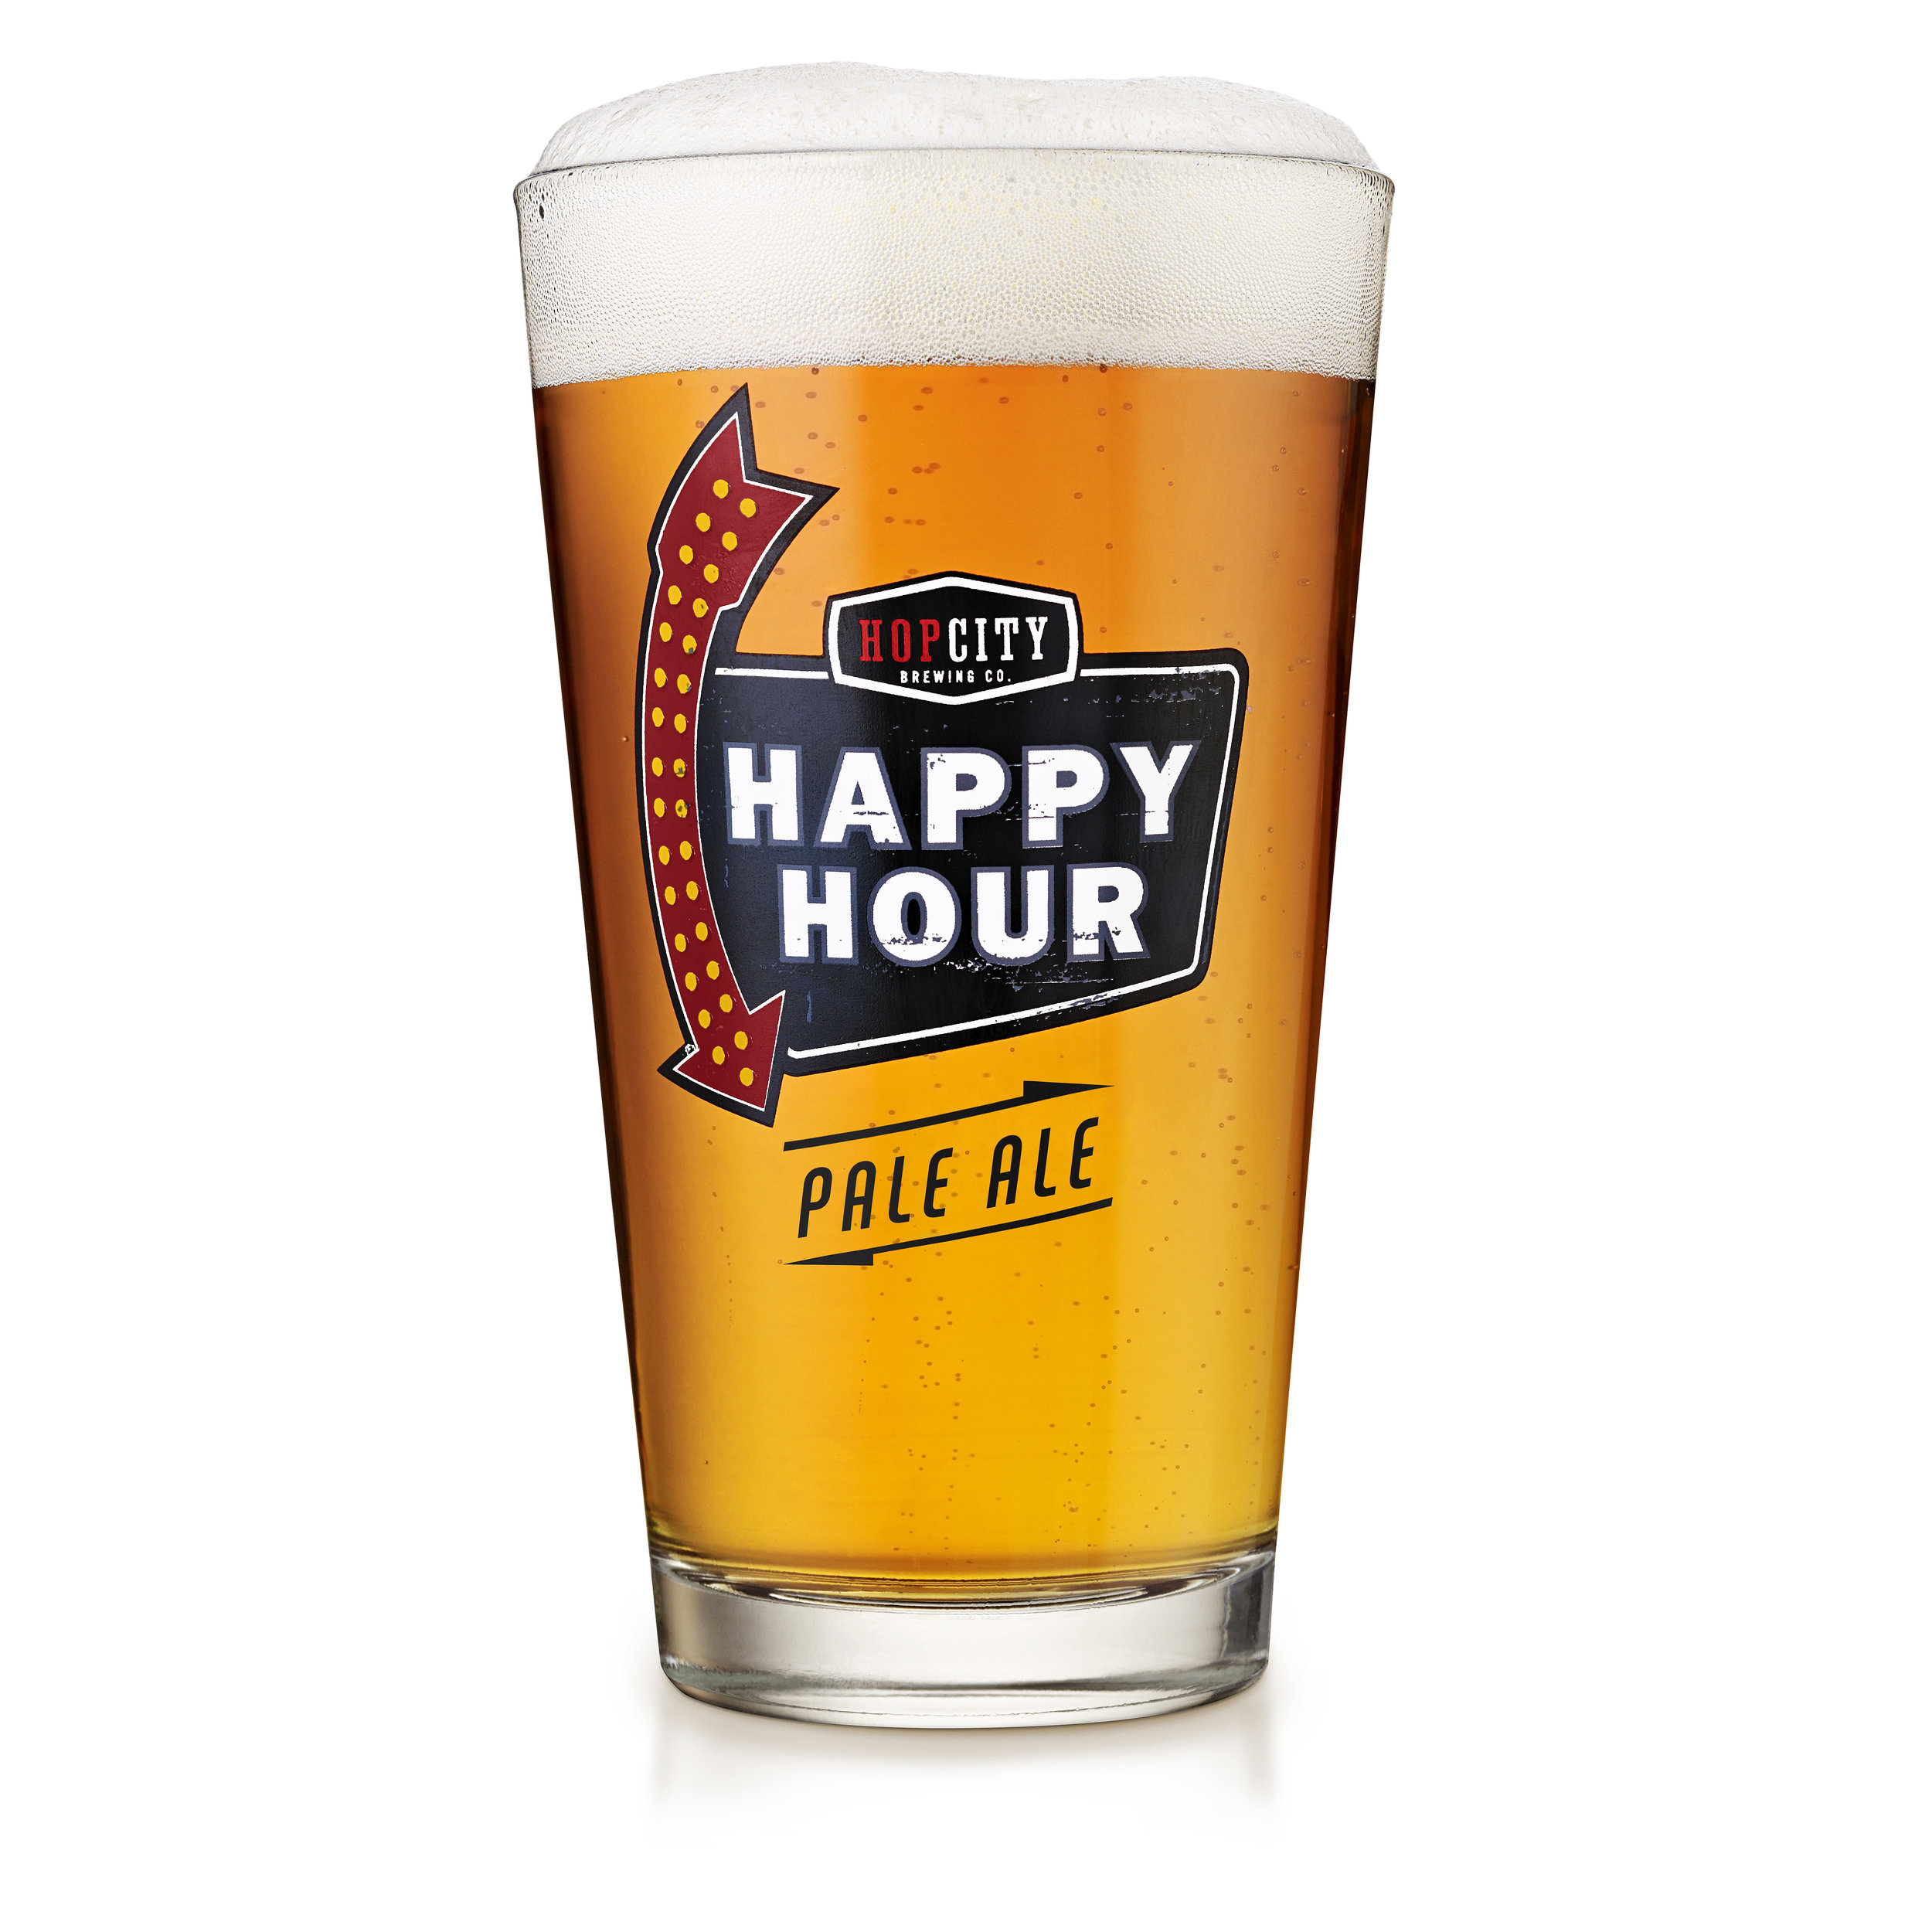 CVFX_PORT_Happy Hour_Pale_Ale_mstr_CJI_WEB.jpg